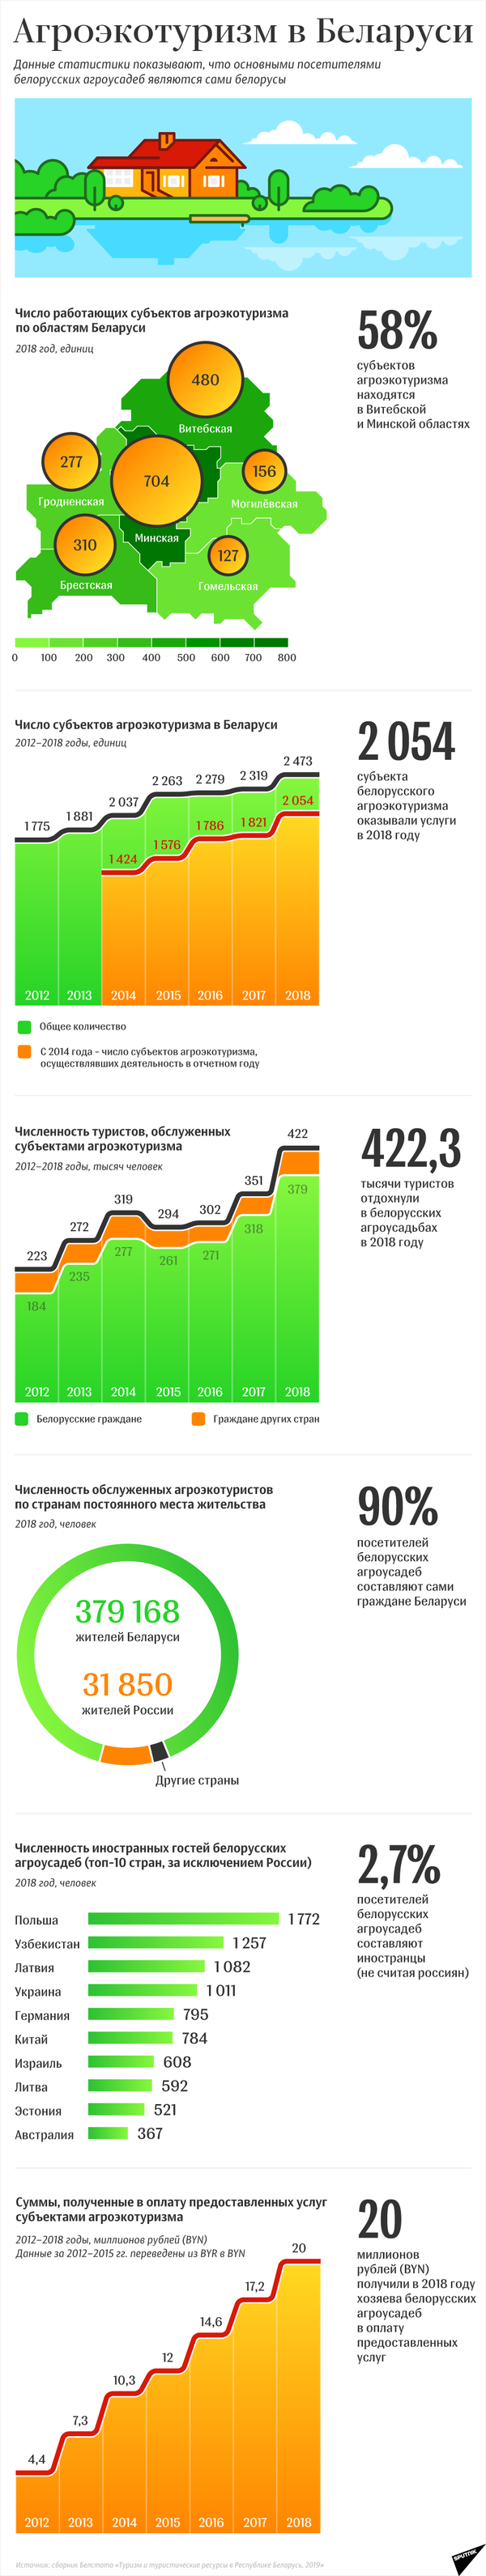 Агроэкотуризм в Беларуси – 2019   Инфографика sputnik.by - Sputnik Беларусь